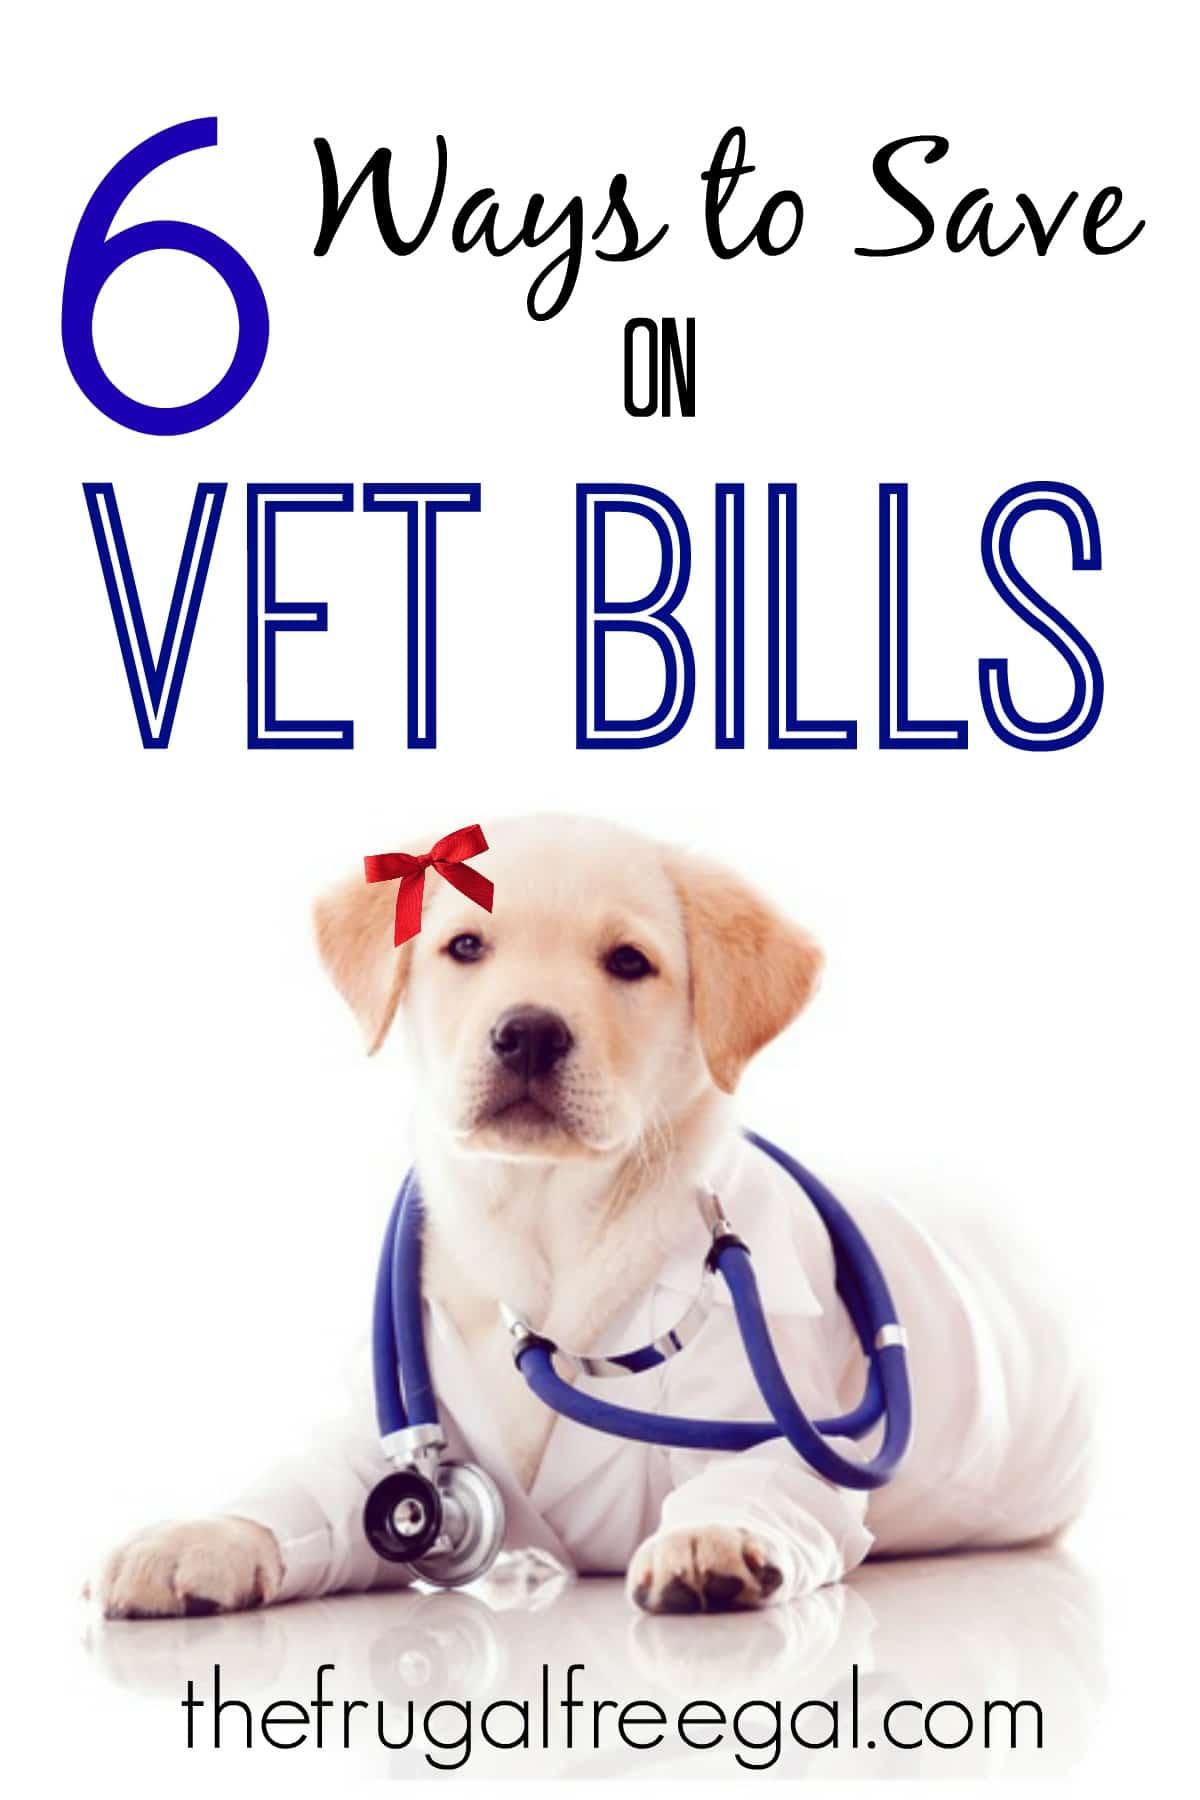 ways to save on vet bills